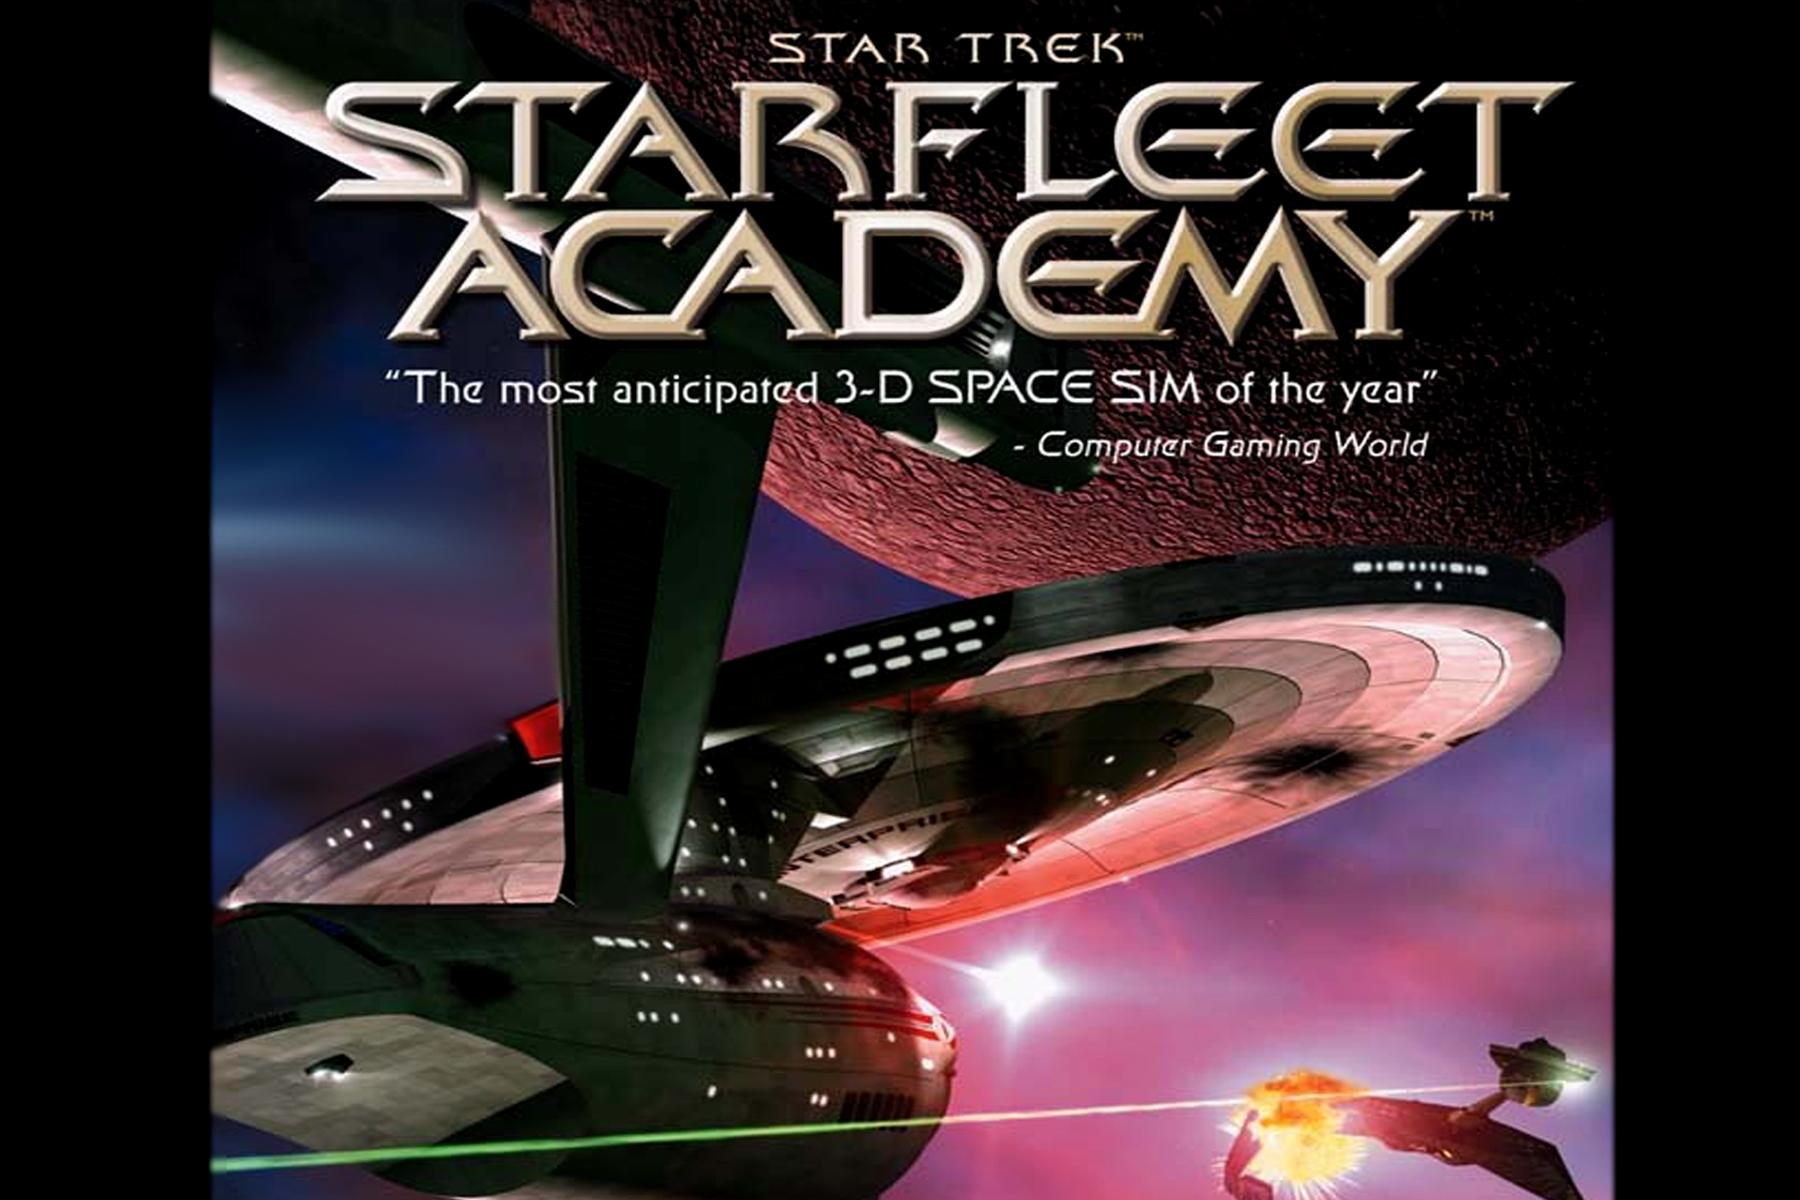 Starfleet Academy 060331.jpg